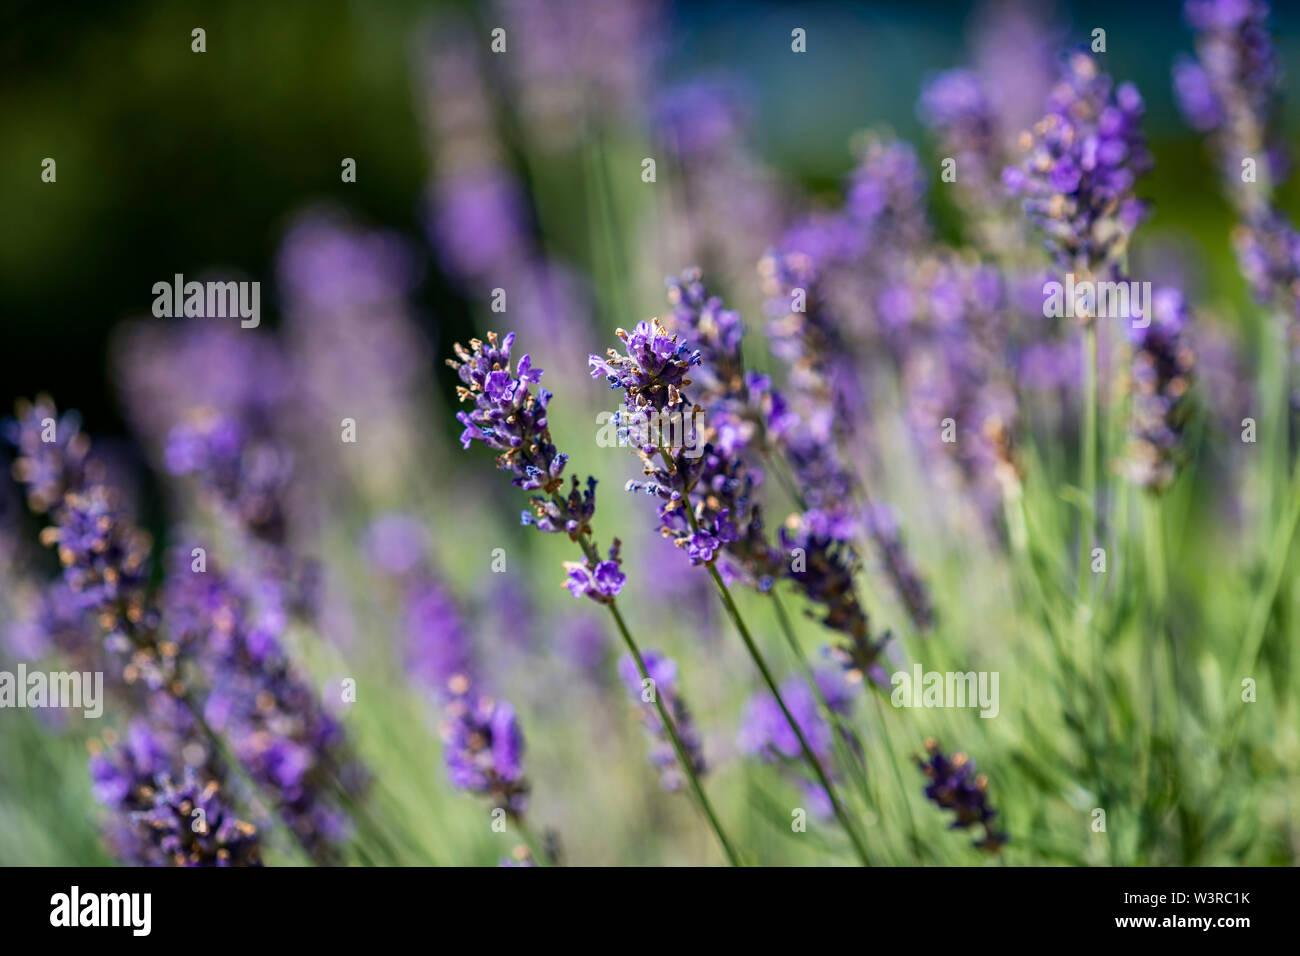 lavender ; duftender Lavendel ; Nahaufnahme; close up; Lavandula angustifolia - Stock Image